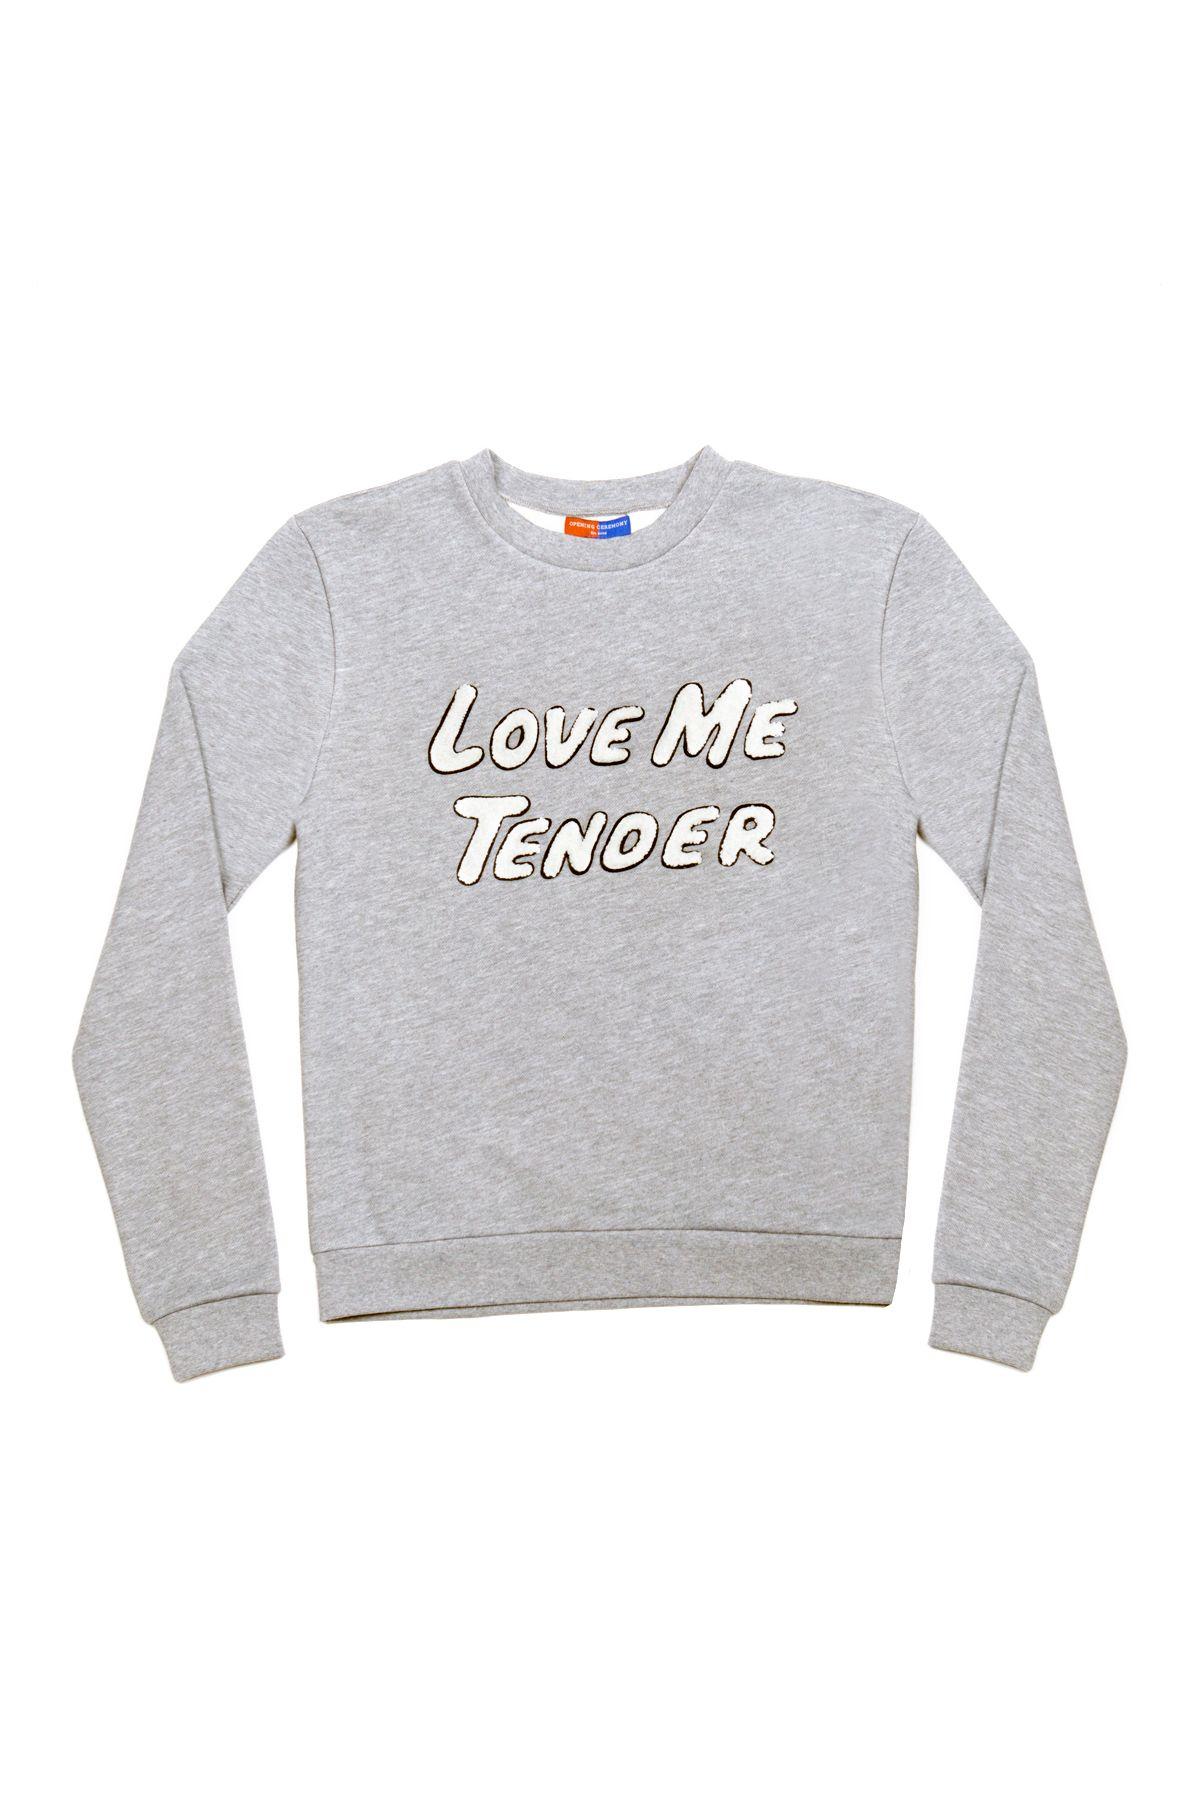 Opening Ceremony x Elvis Love Me Tender Sweatshirt